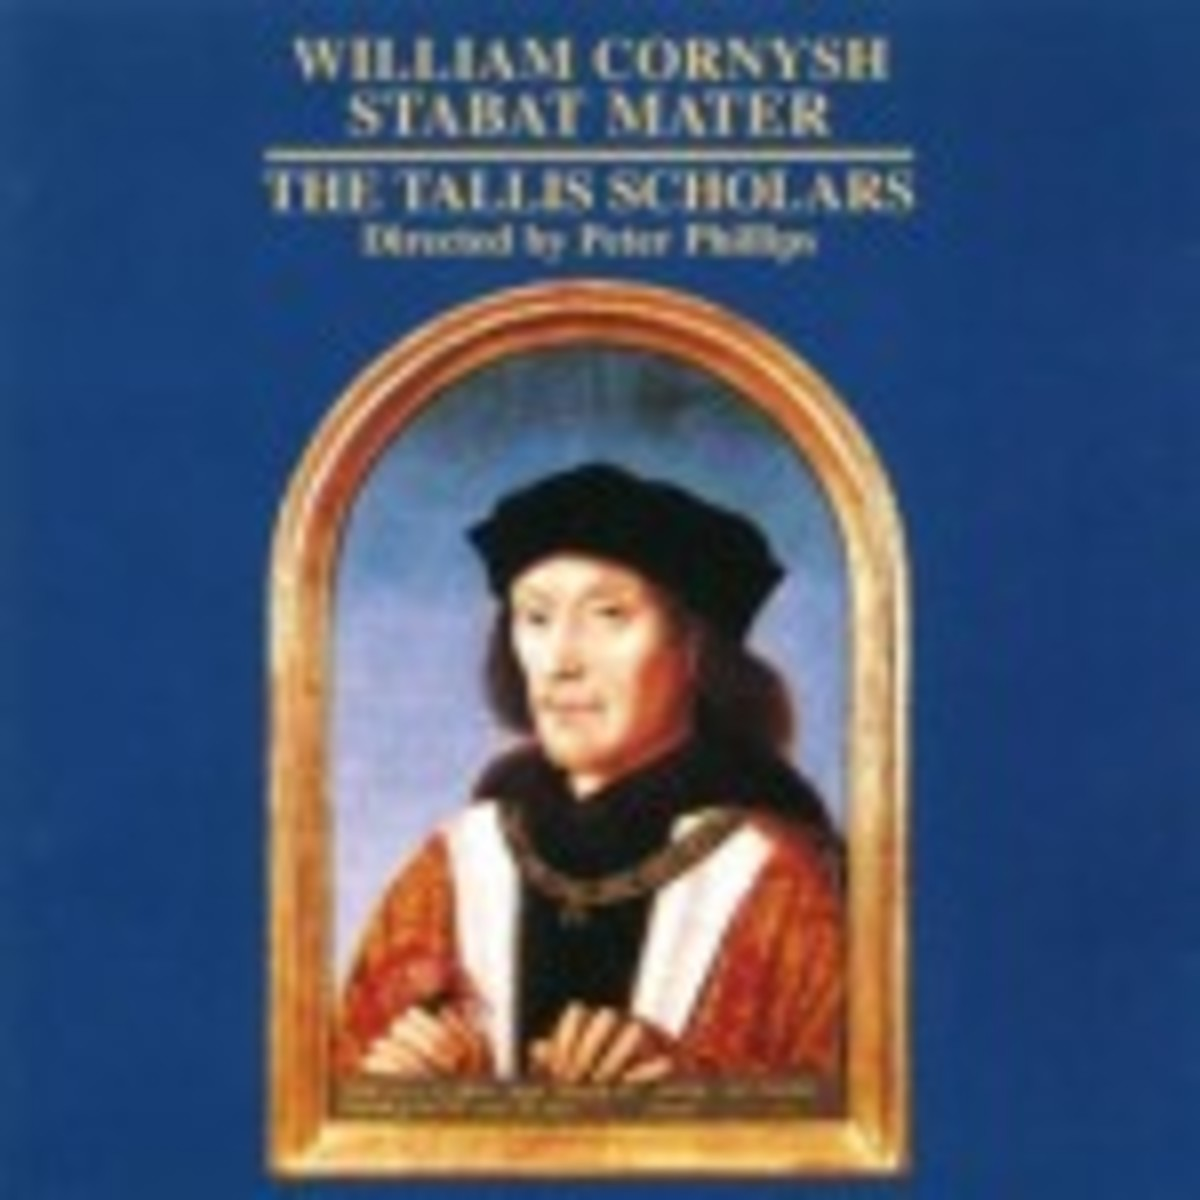 Tallis Scholars Stabat Mater